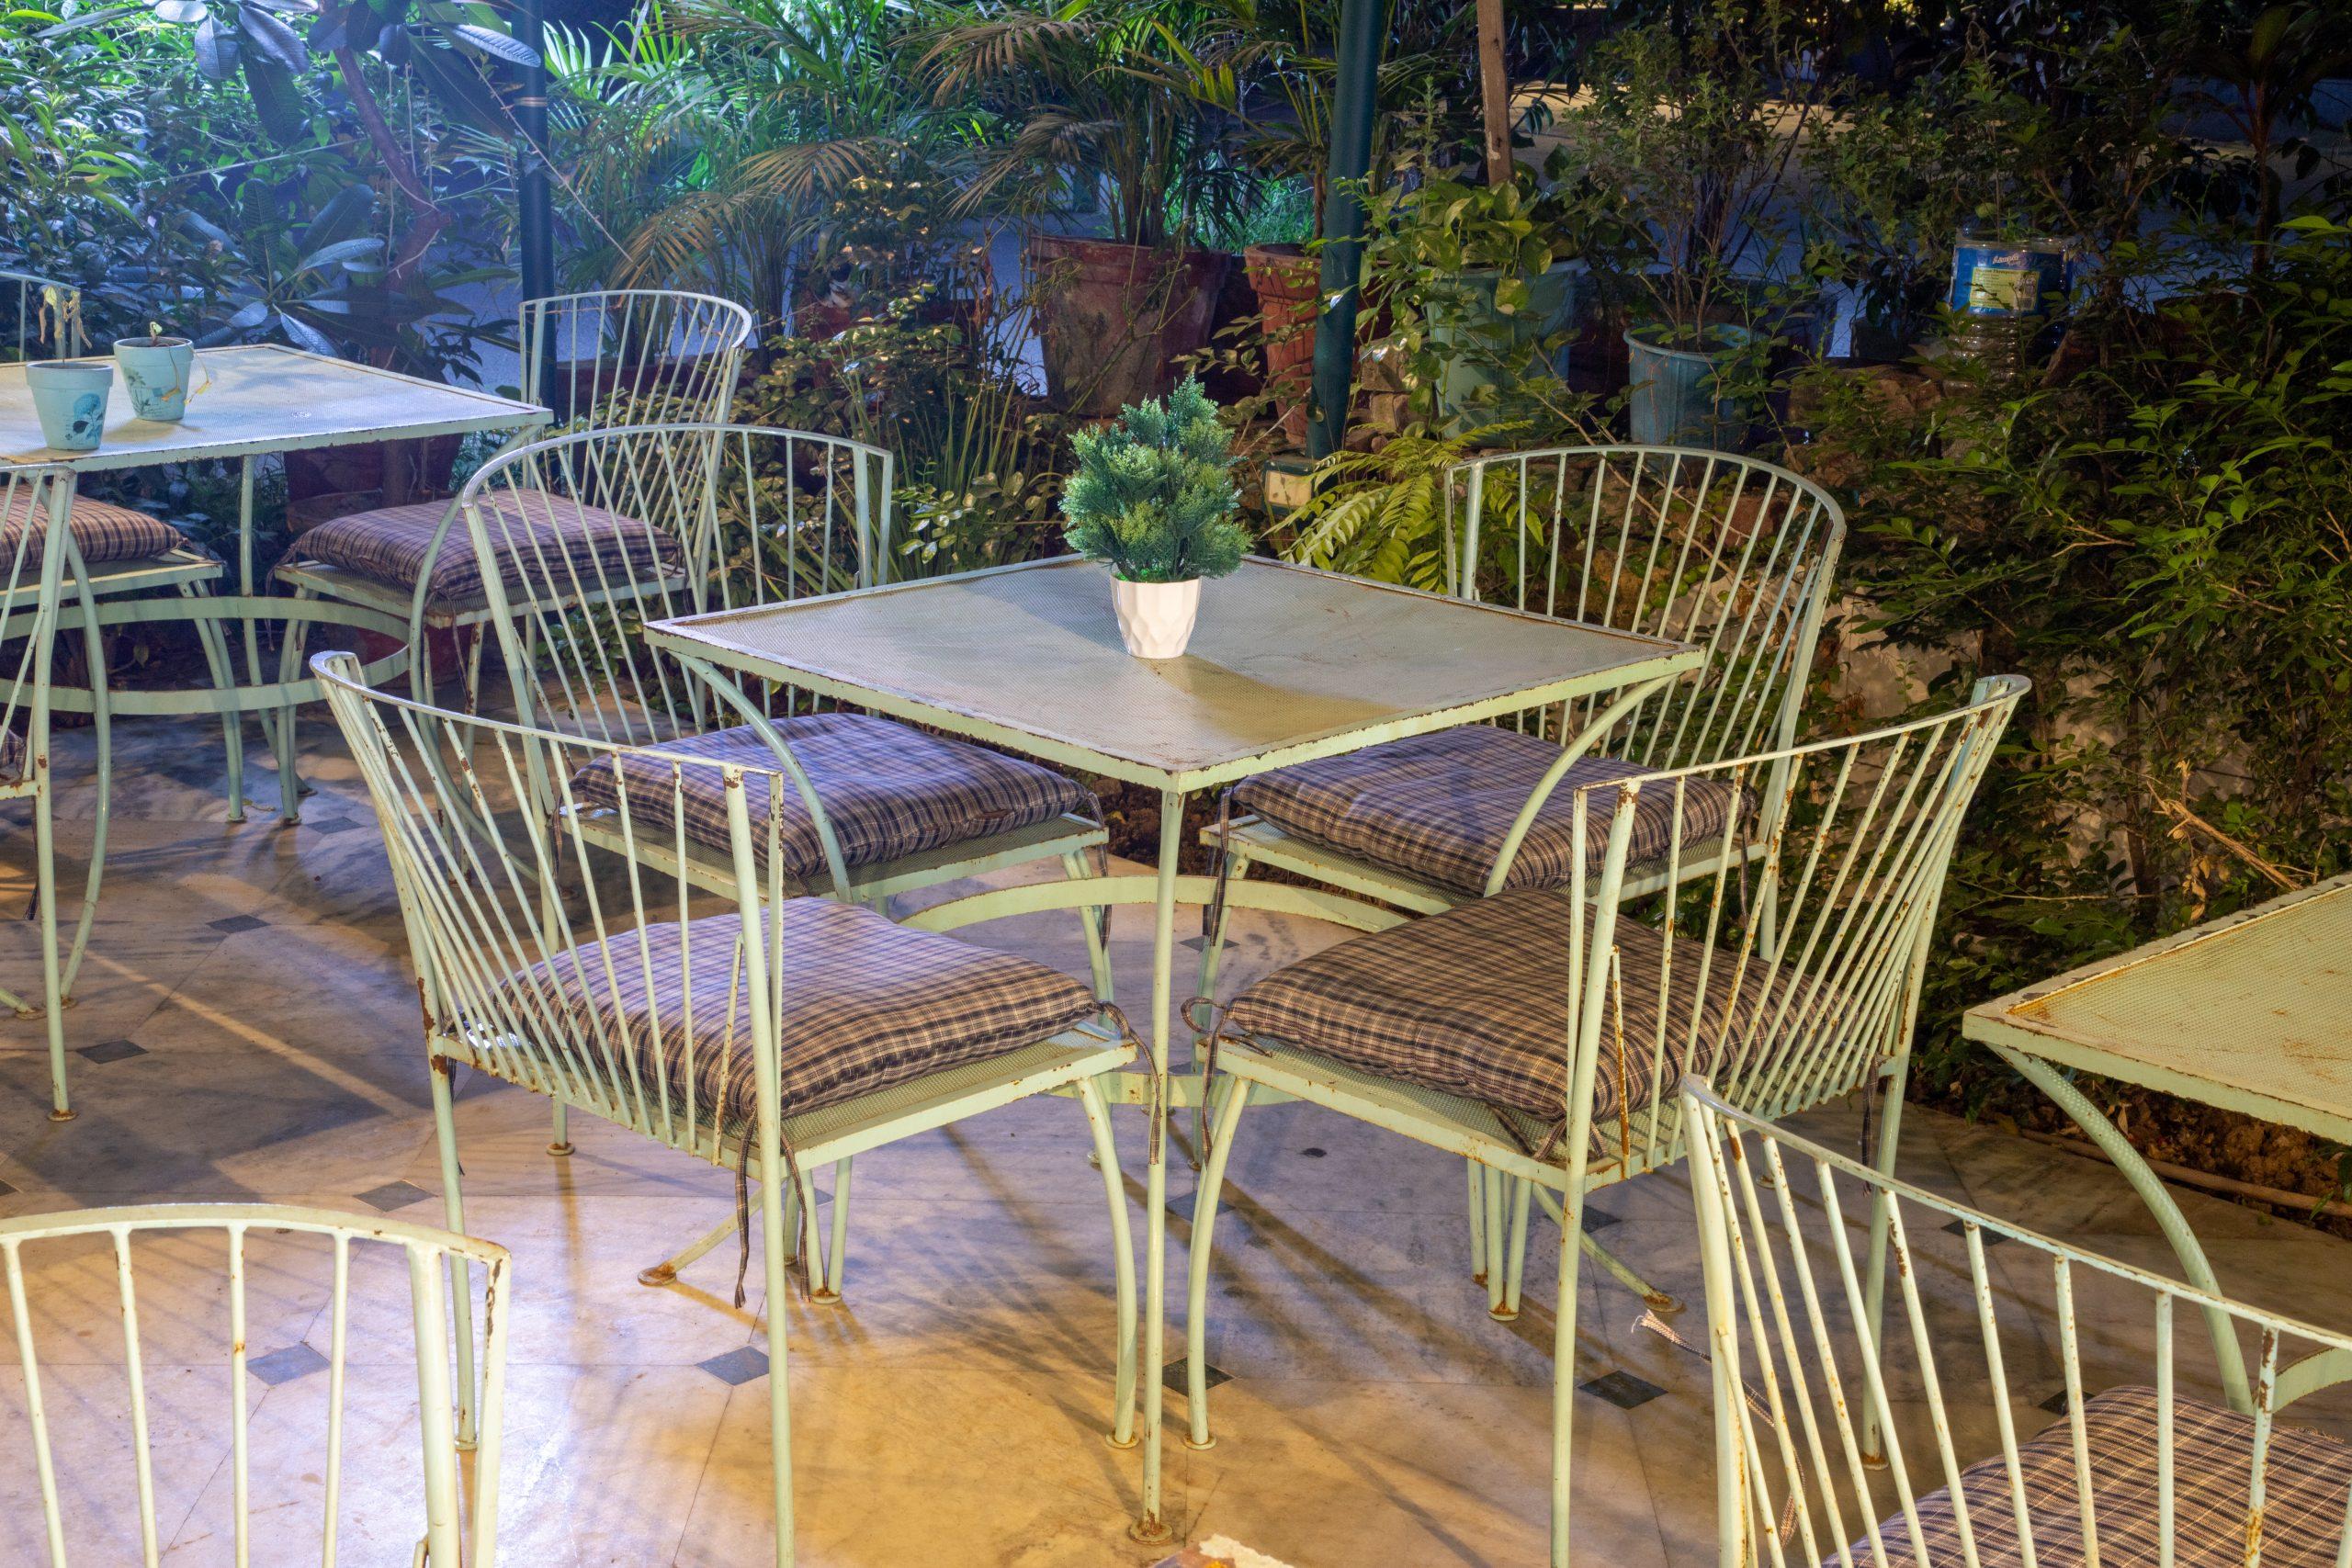 Restaurant dinning table